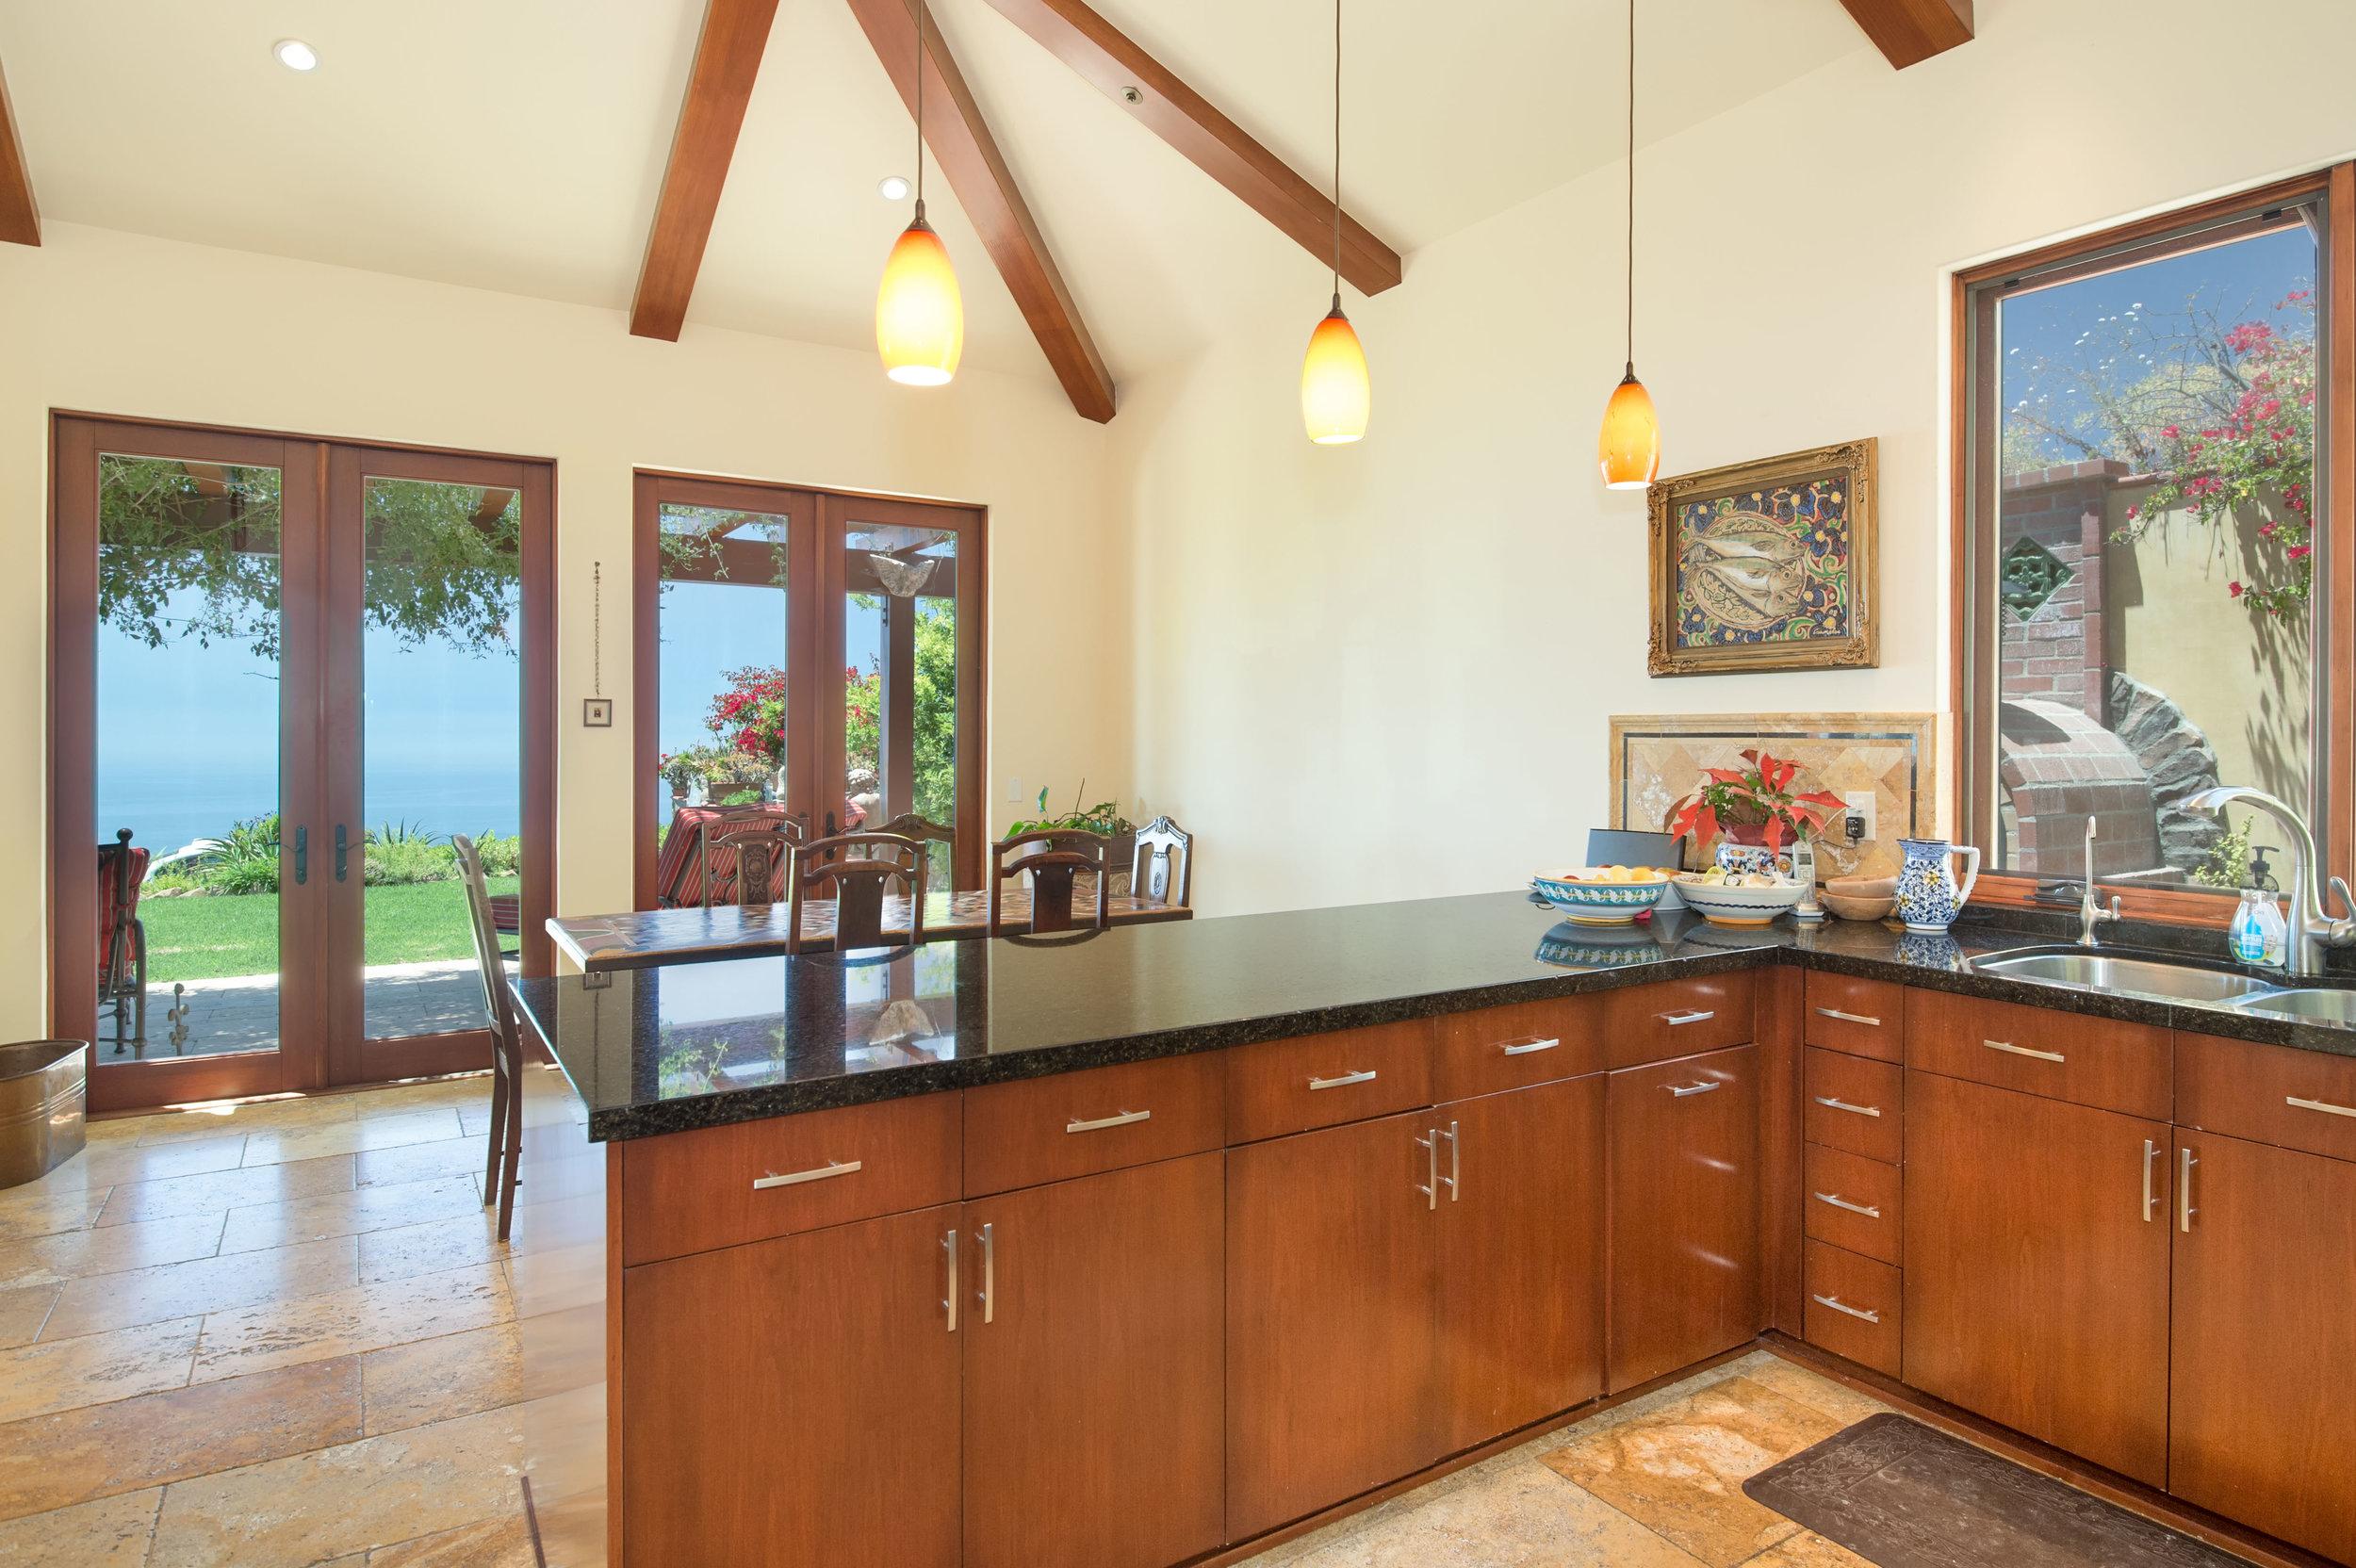 008 Kitchen 26303 Lockwood Road Malibu For Sale Lease The Malibu Life Team Luxury Real Estate.jpg